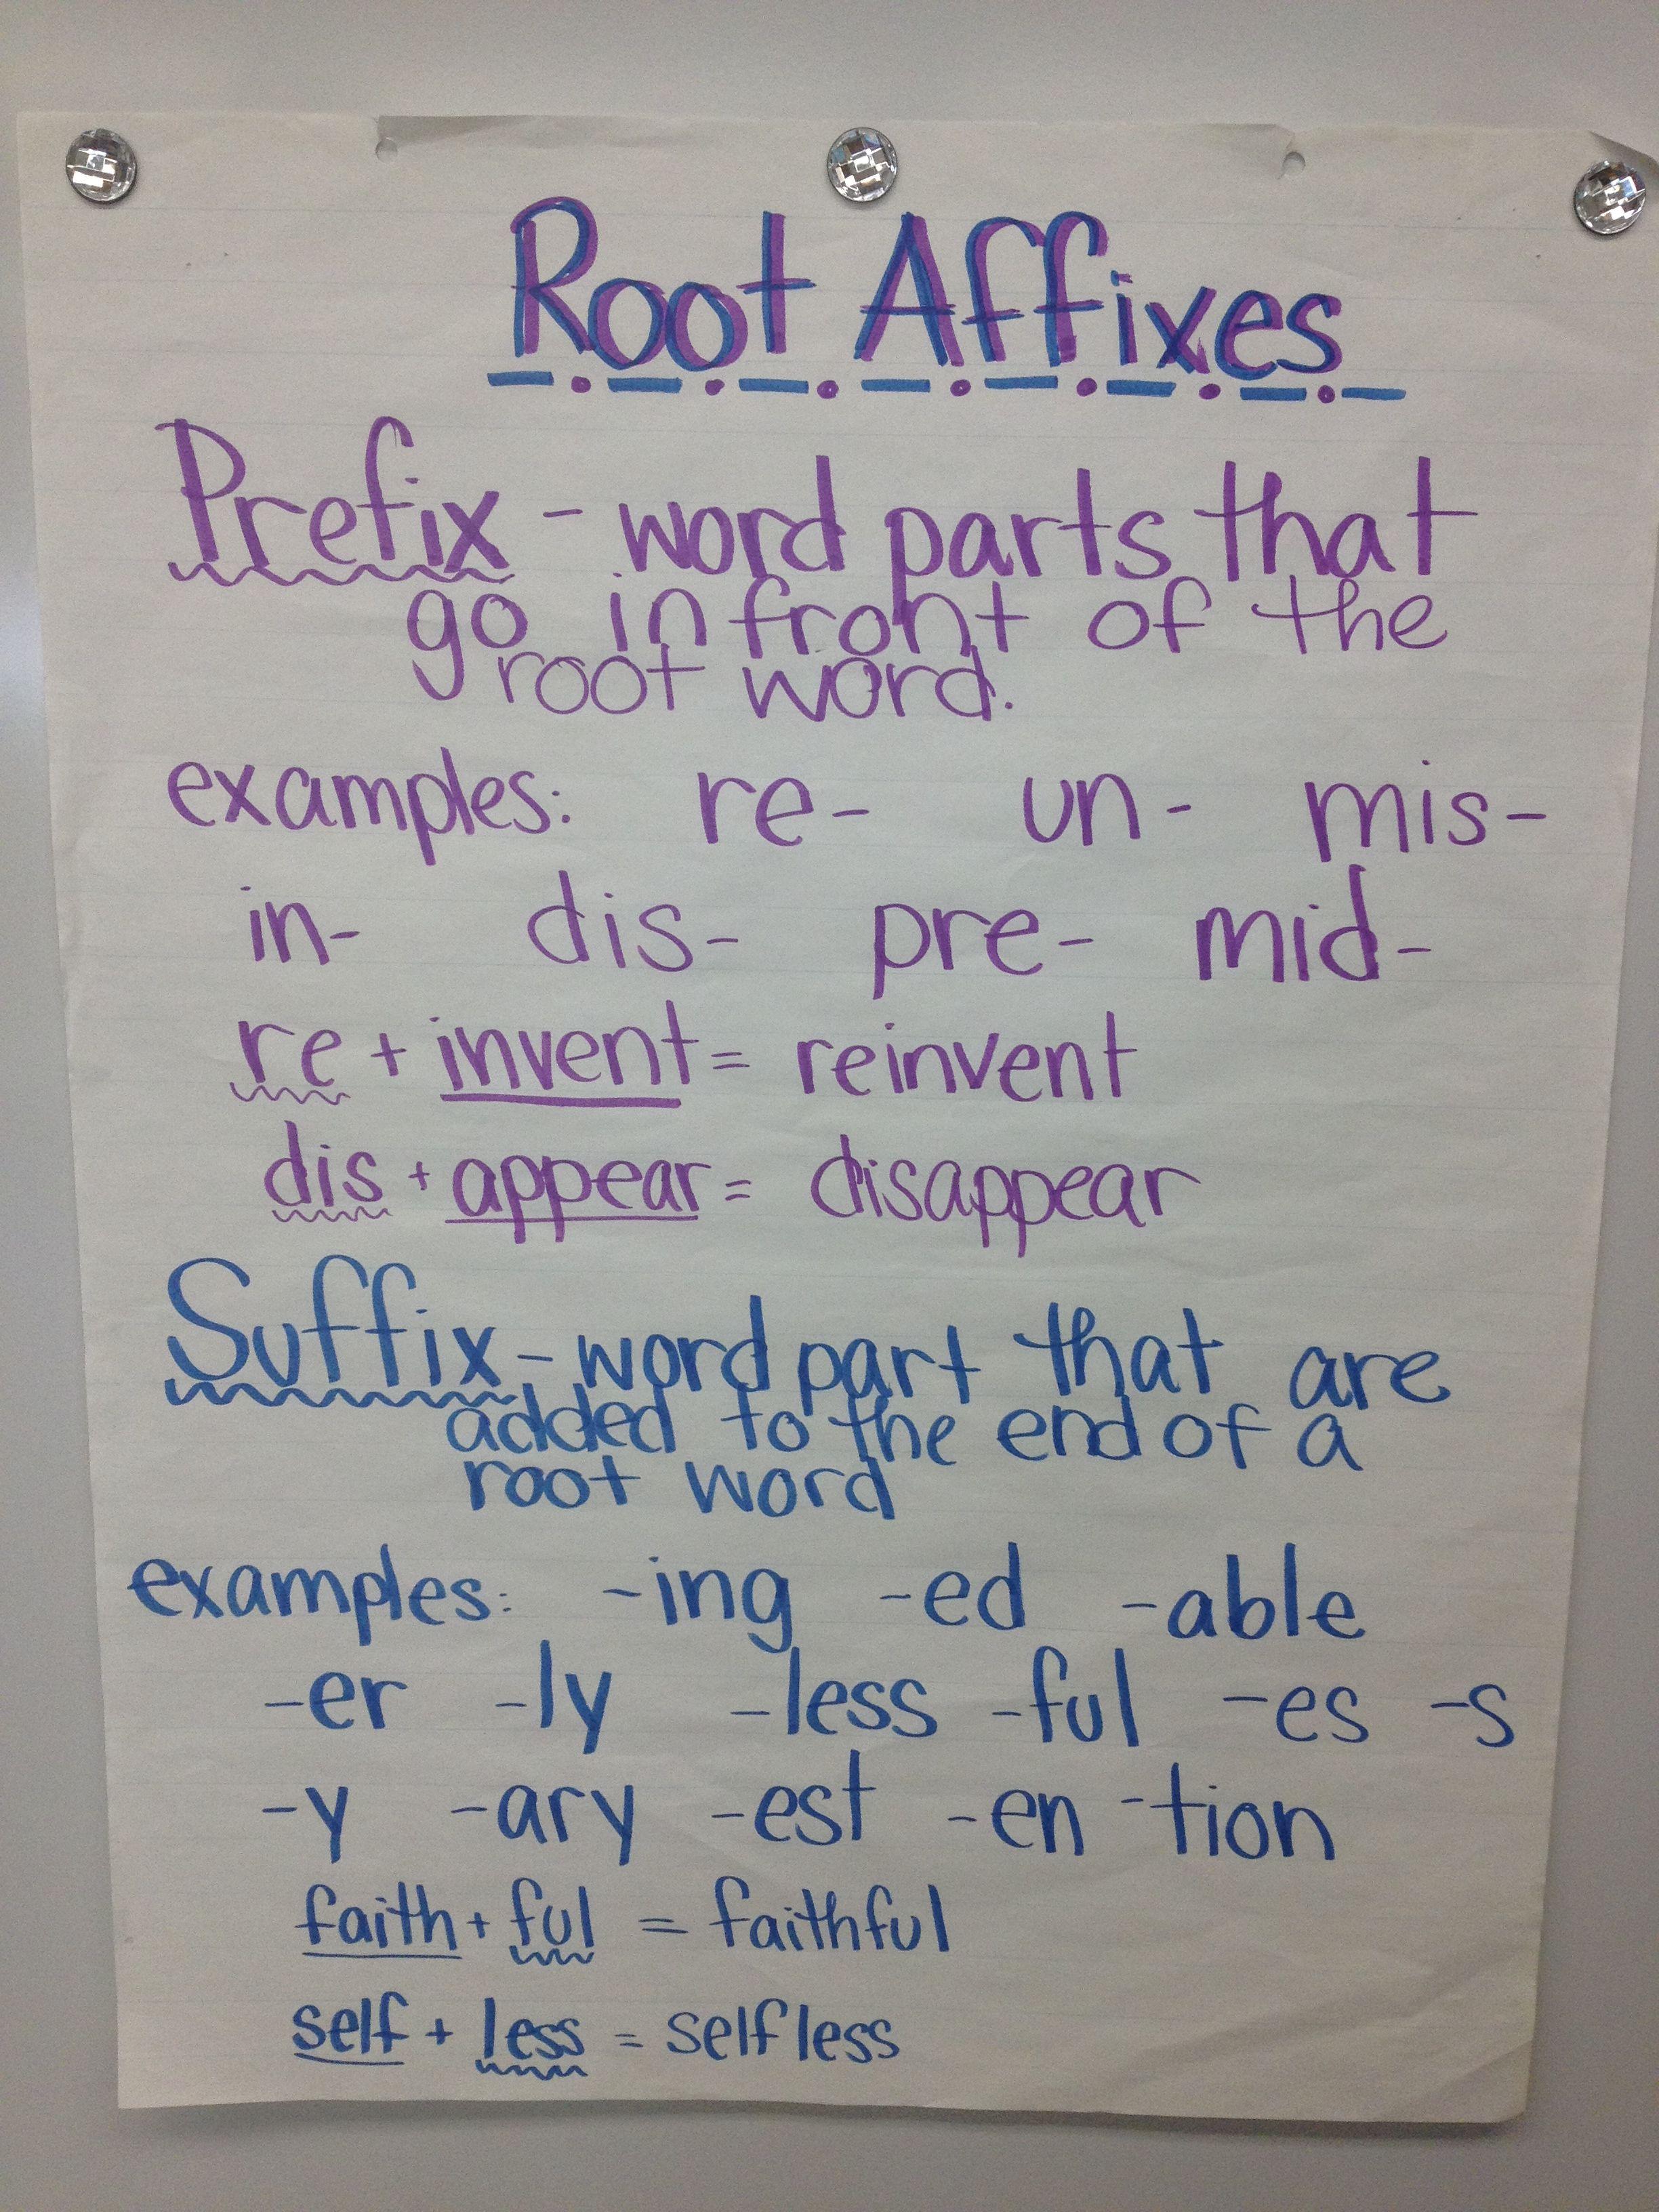 Root Affixes